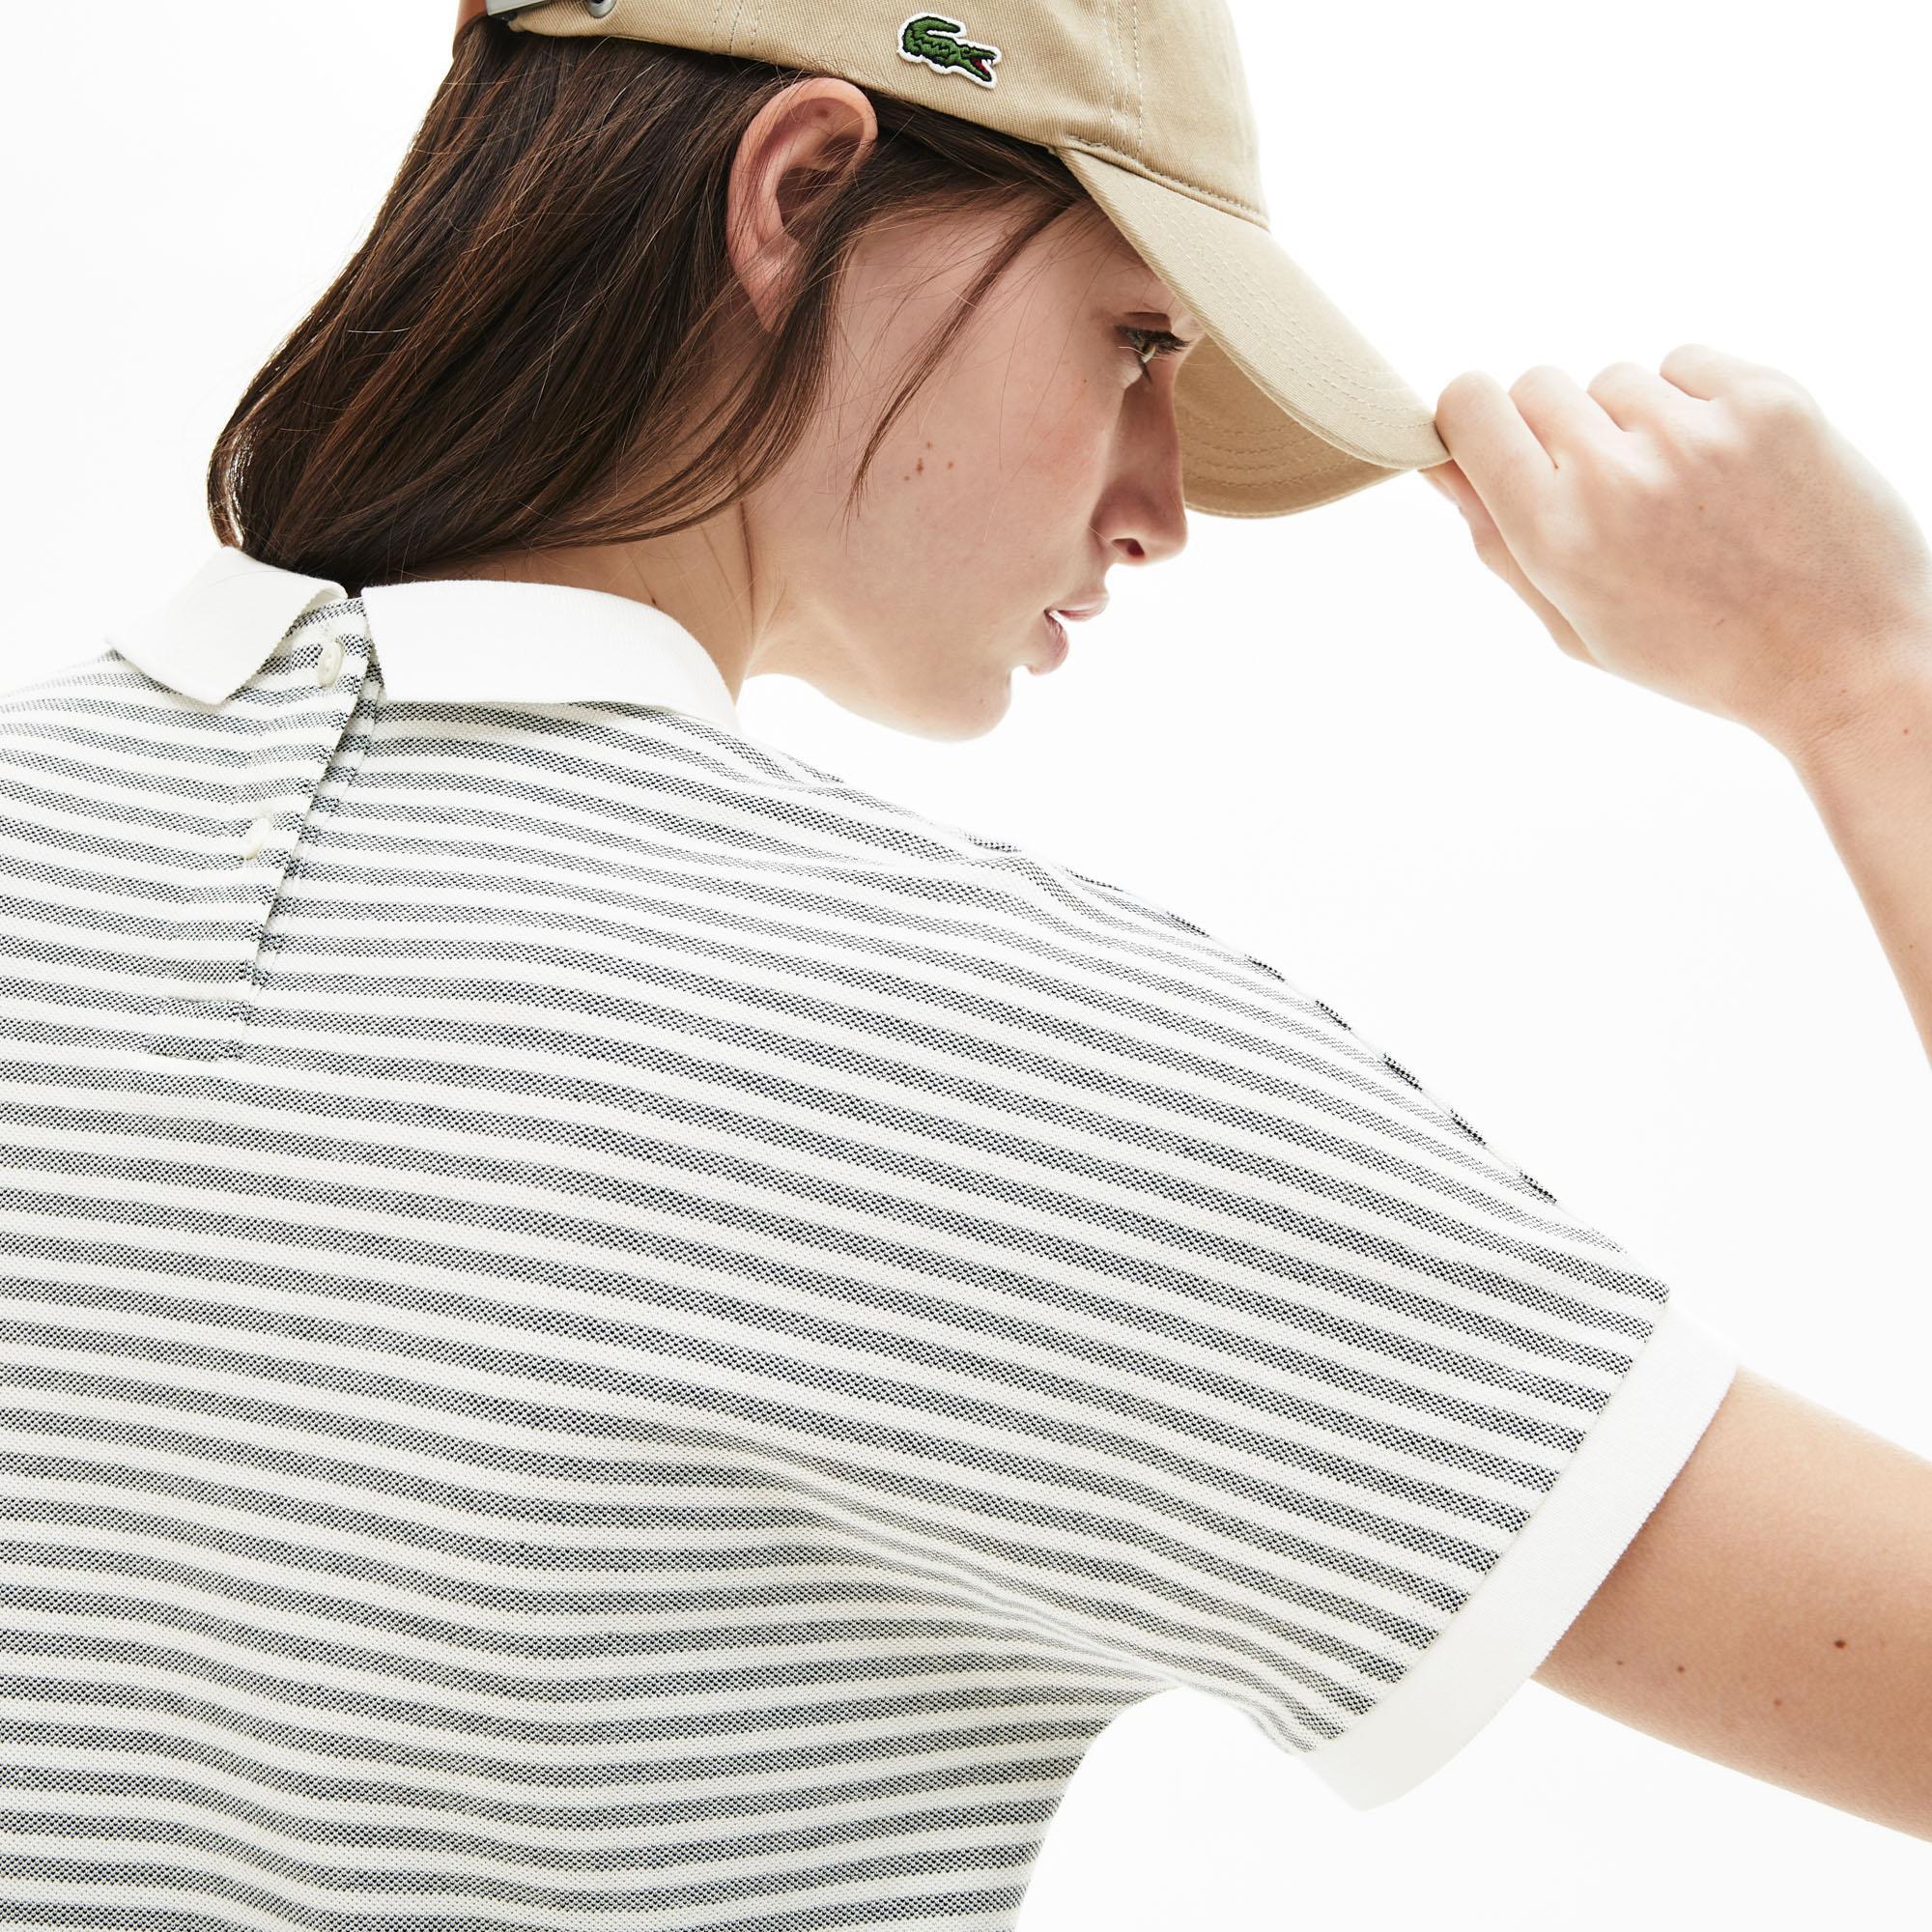 Lacoste Damska Koszulka Polo W Paski